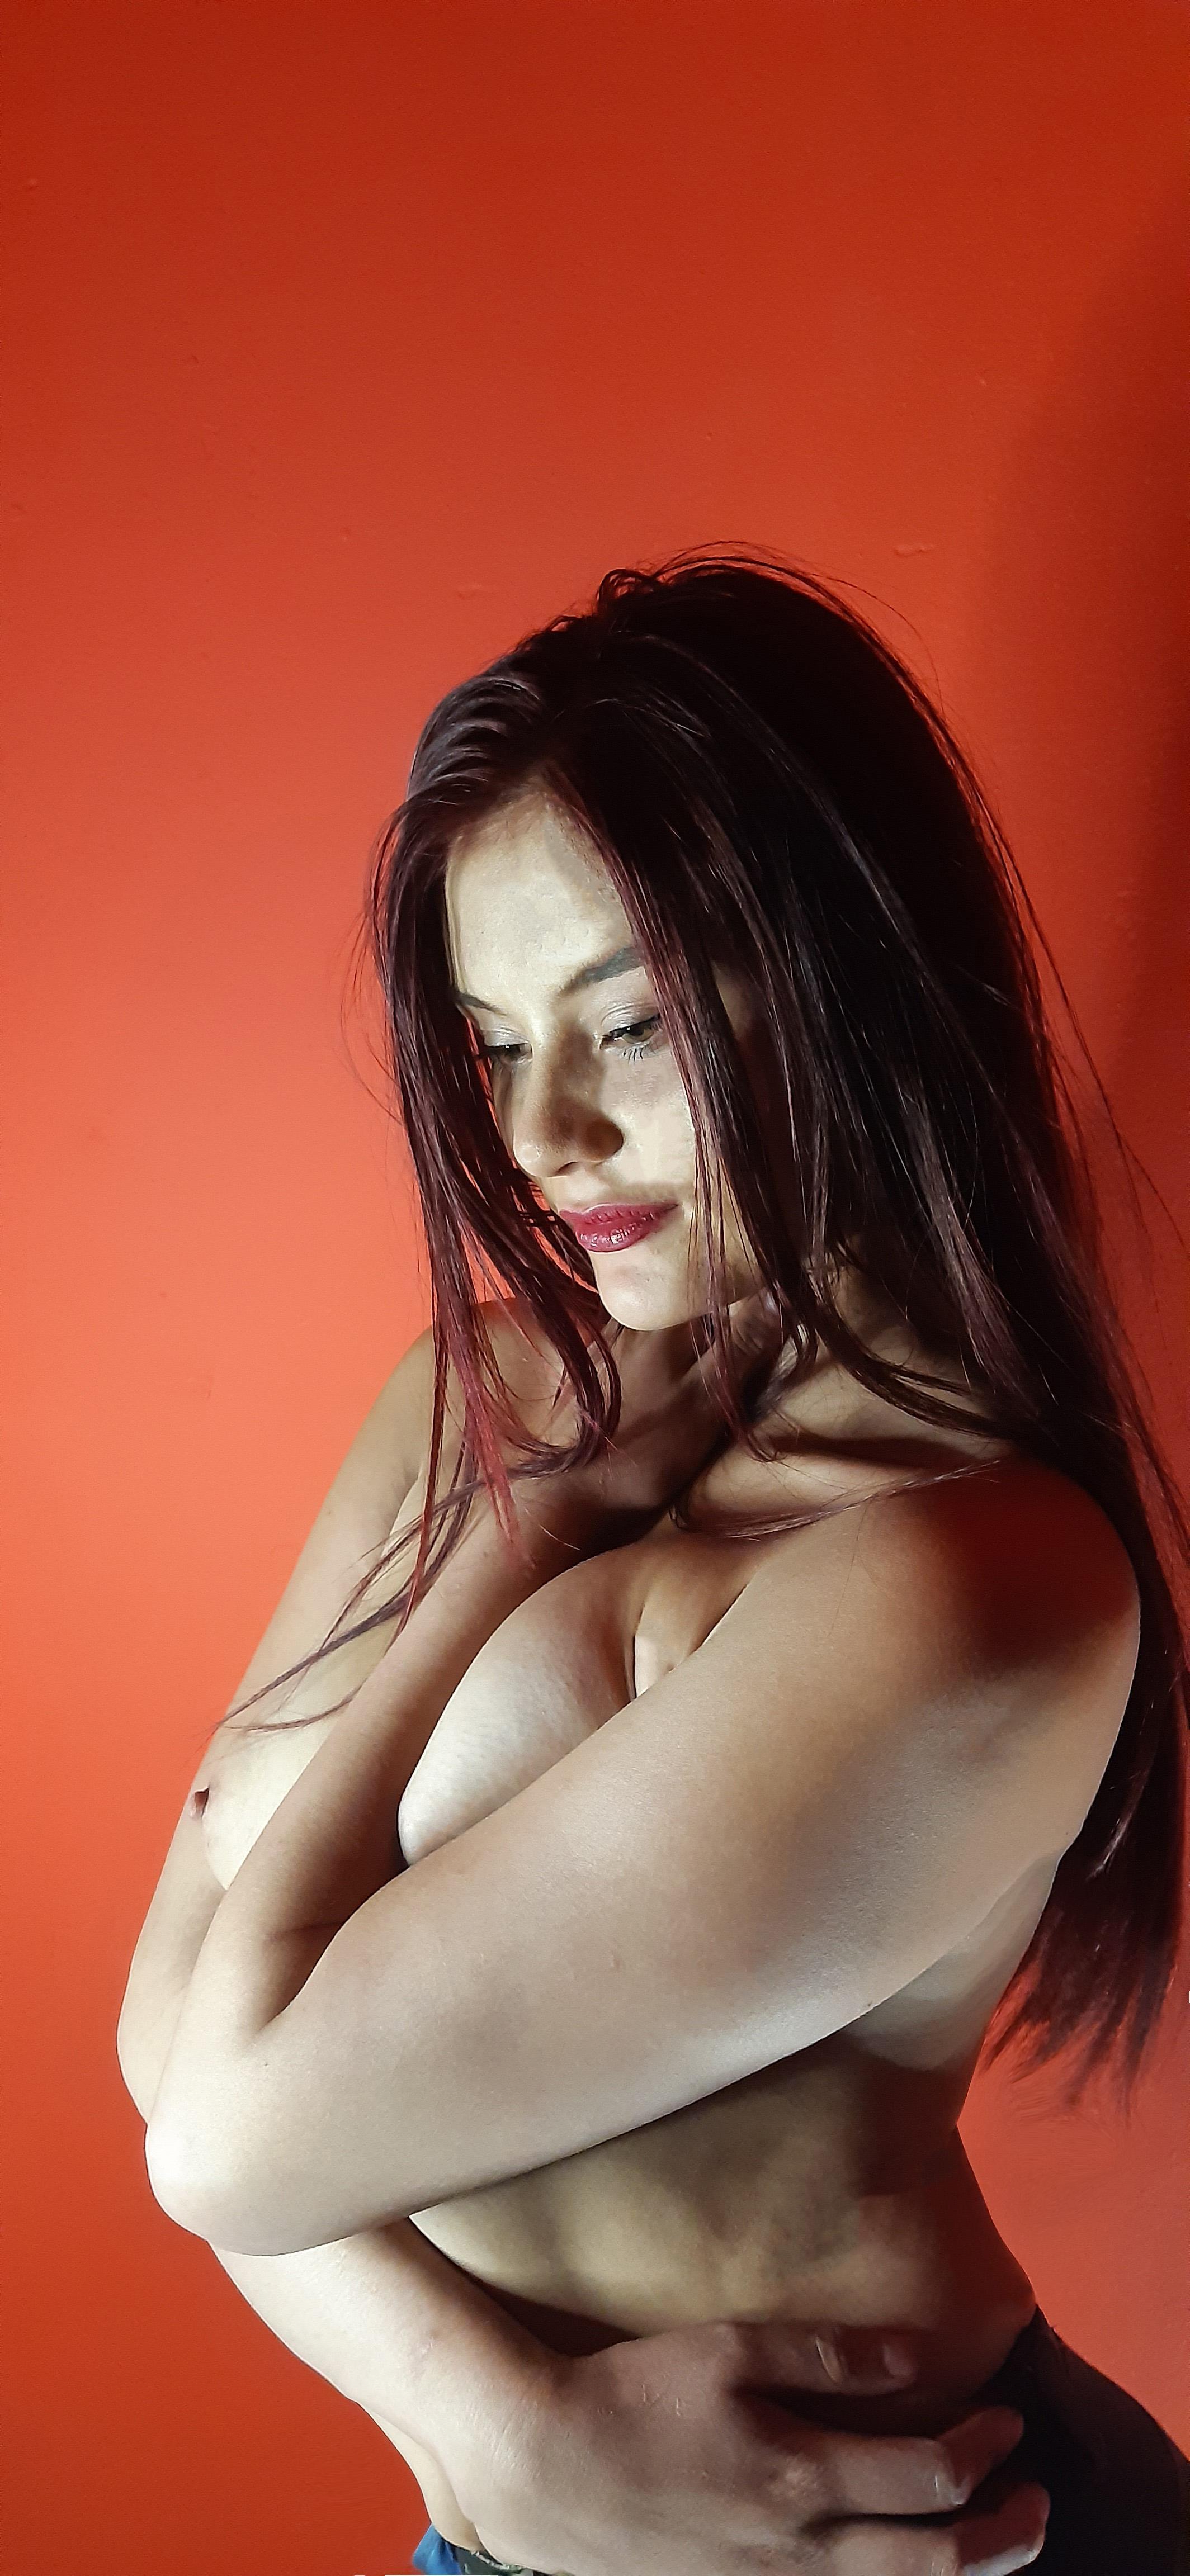 Nicole trevor?s=9233sq9juzf8xdryjon17tg+zahs5lzpcaz28eprgc0=